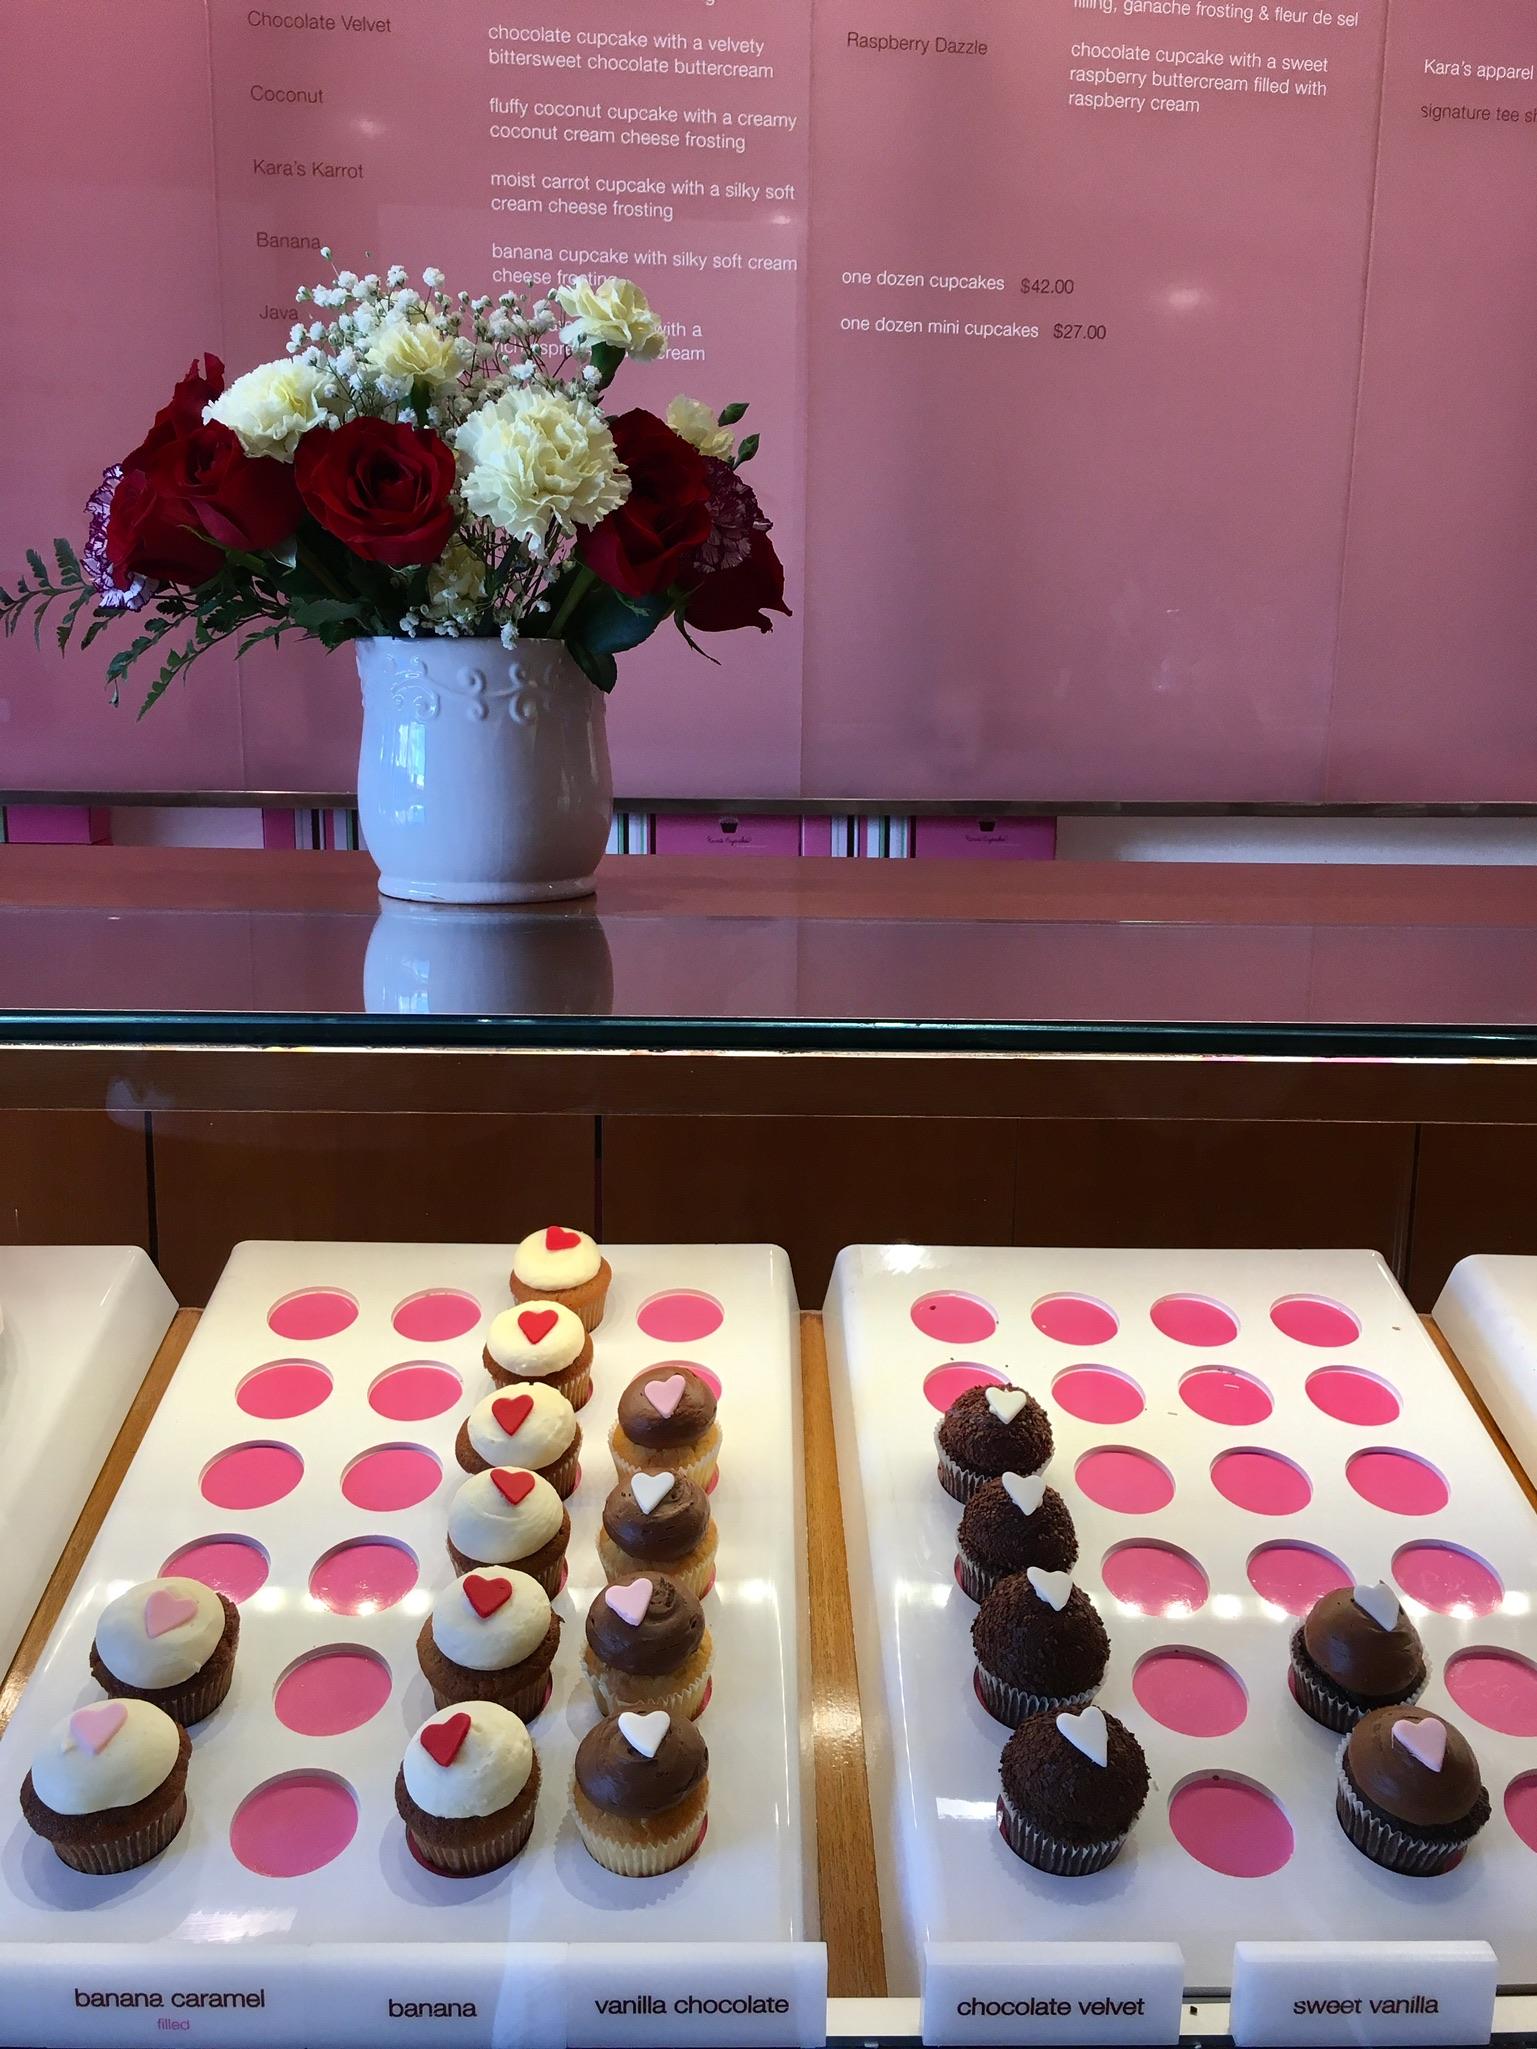 Cupcake Display at Kara's Cupcakes in San Francisco California